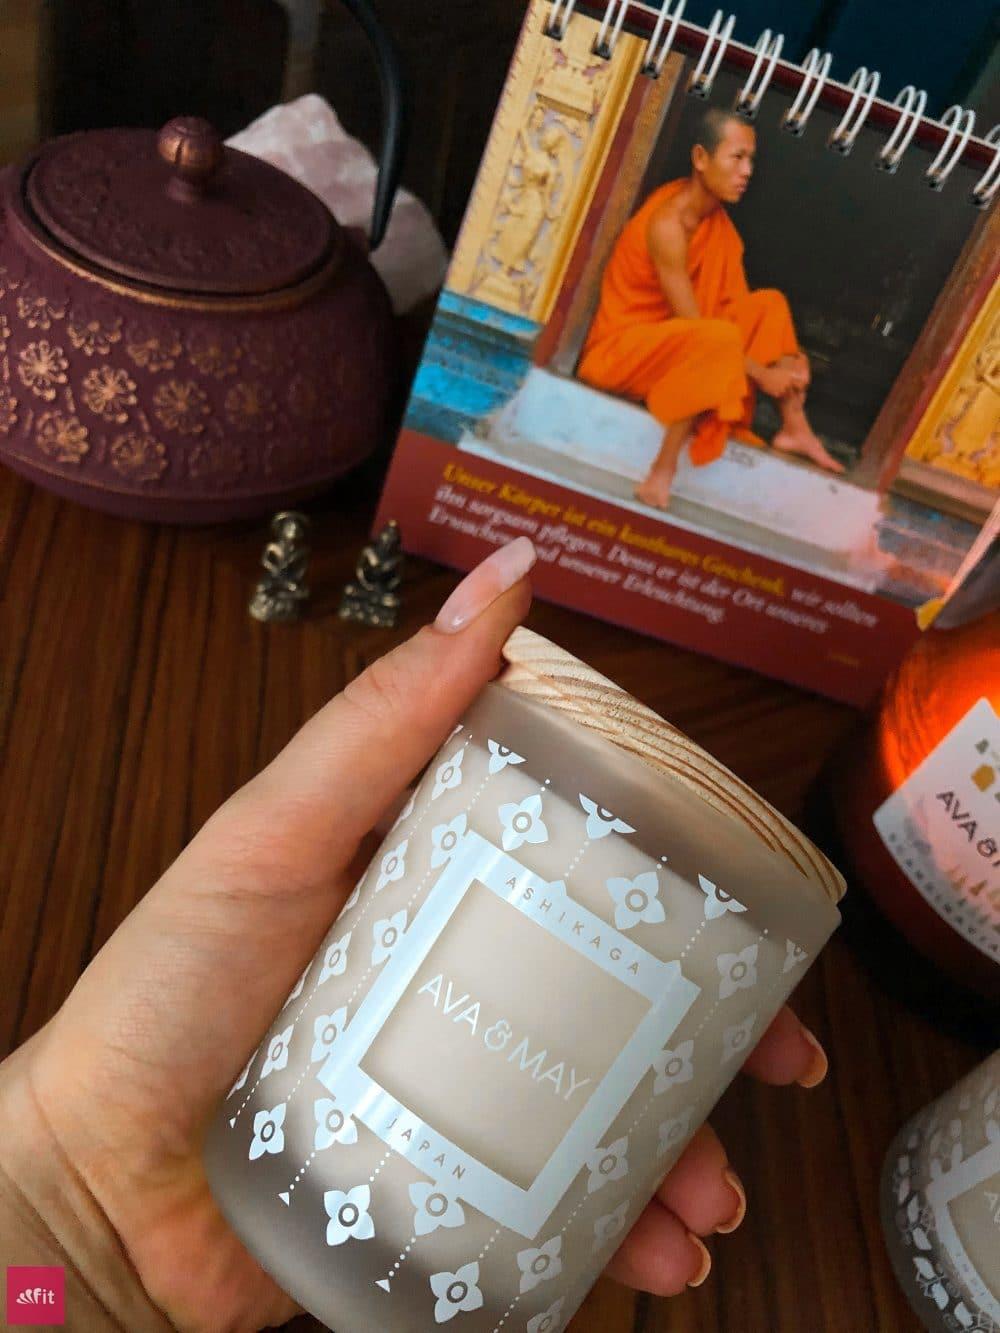 Ashikaga Massagekerze Japan Ava and May Duftkerze Erfahrungen Bewertung